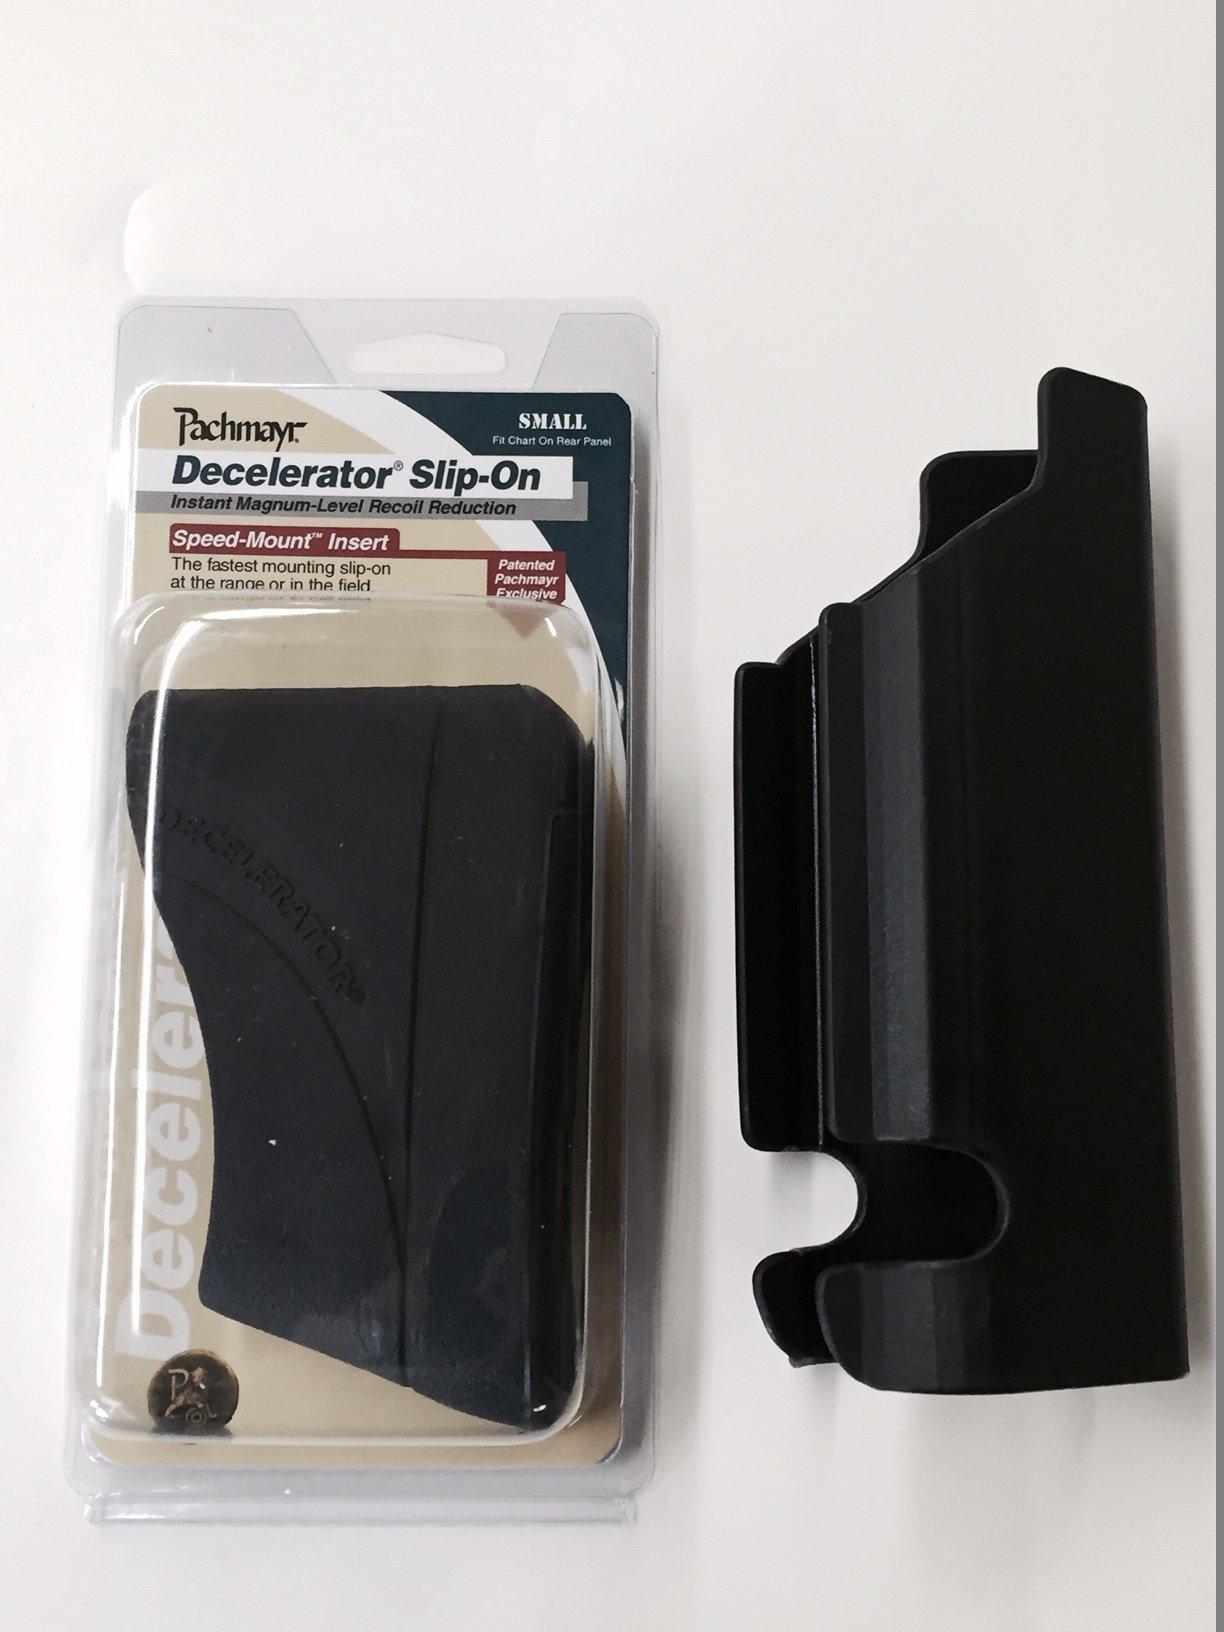 Hi-Tech Custom Concepts Kel-Tec KSG Shotgun Decelerator Recoil Reduction Pad- Slip-On + Snap on Cheek Rest Combo Pack - from Inc. by Hi-Tech Custom Concepts